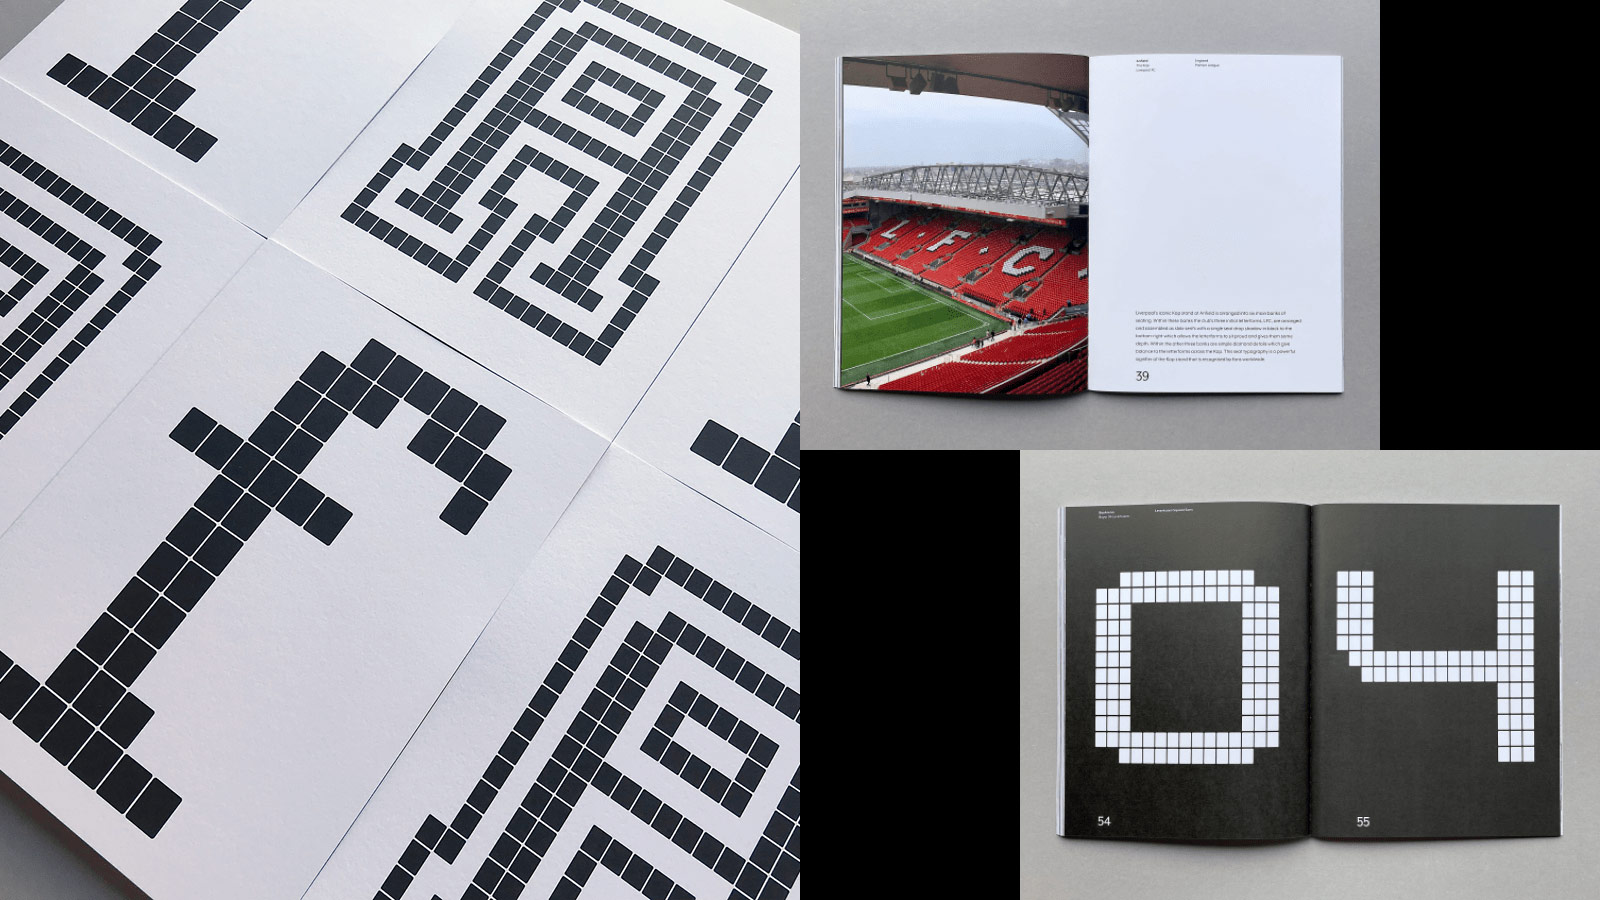 branding-identity-design-sport-football-graphics-dinkit-artwork-prints-posters-gallery-milton-keynes-london-11